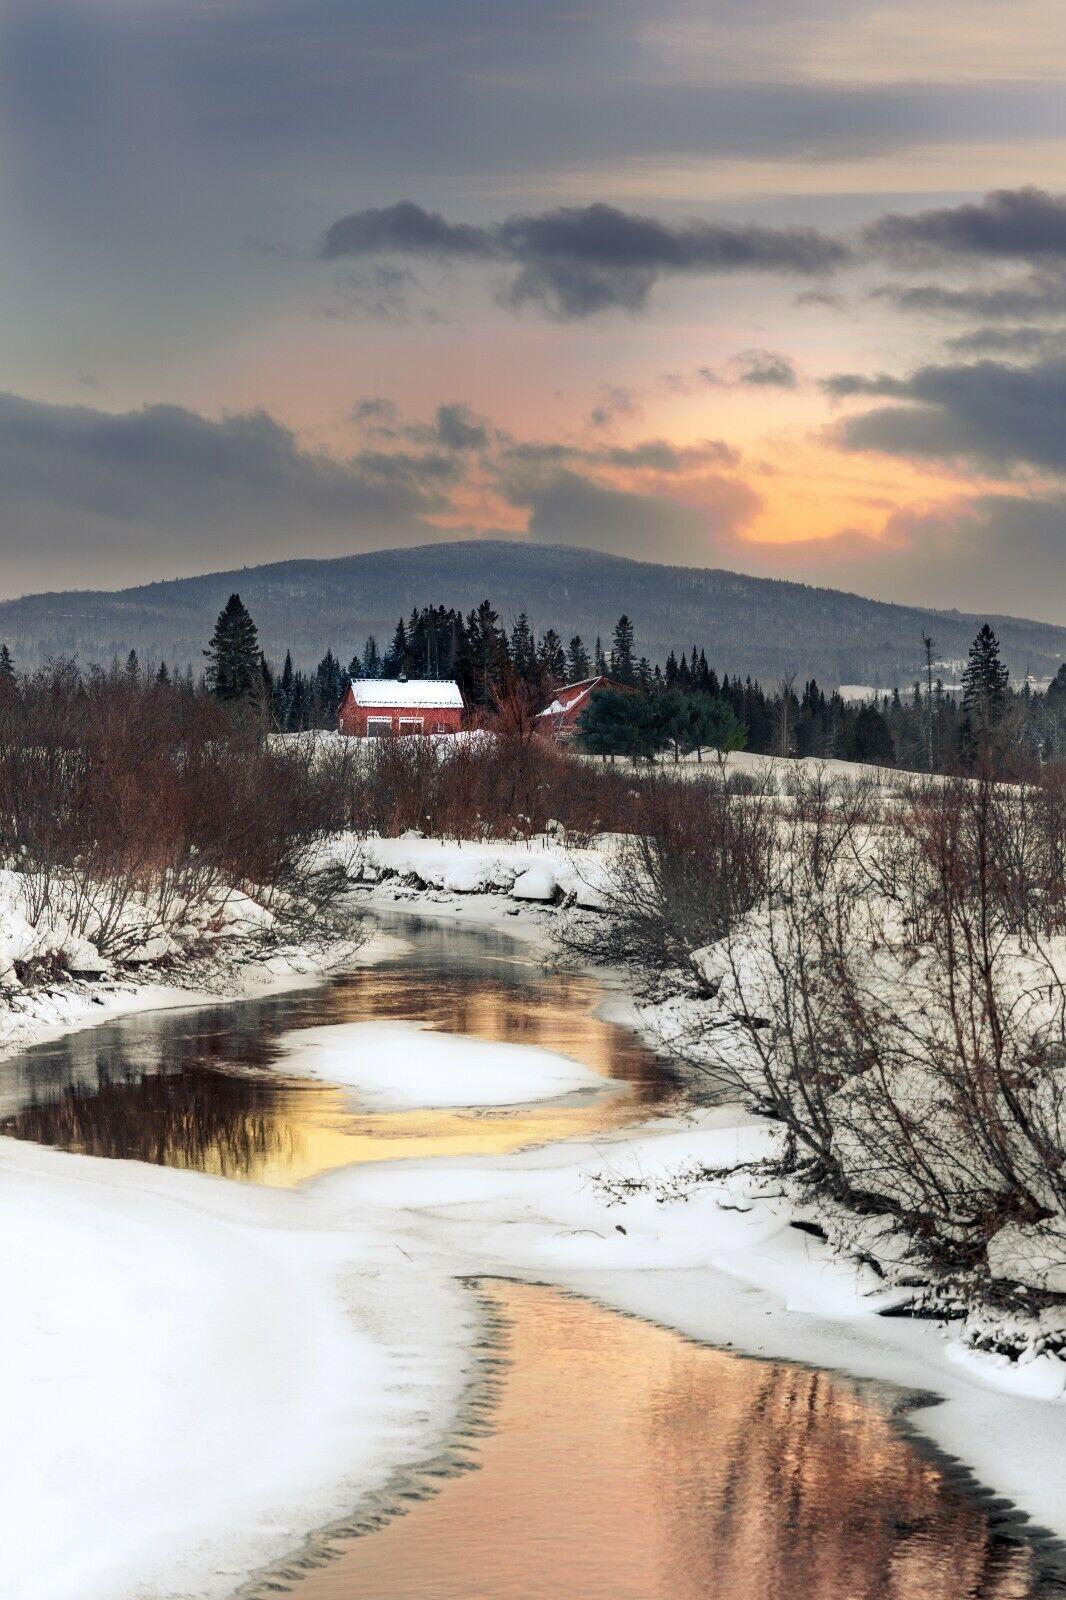 Peter Lik style original Fine Art Landscape Photography Print by Alex Vershinin 10